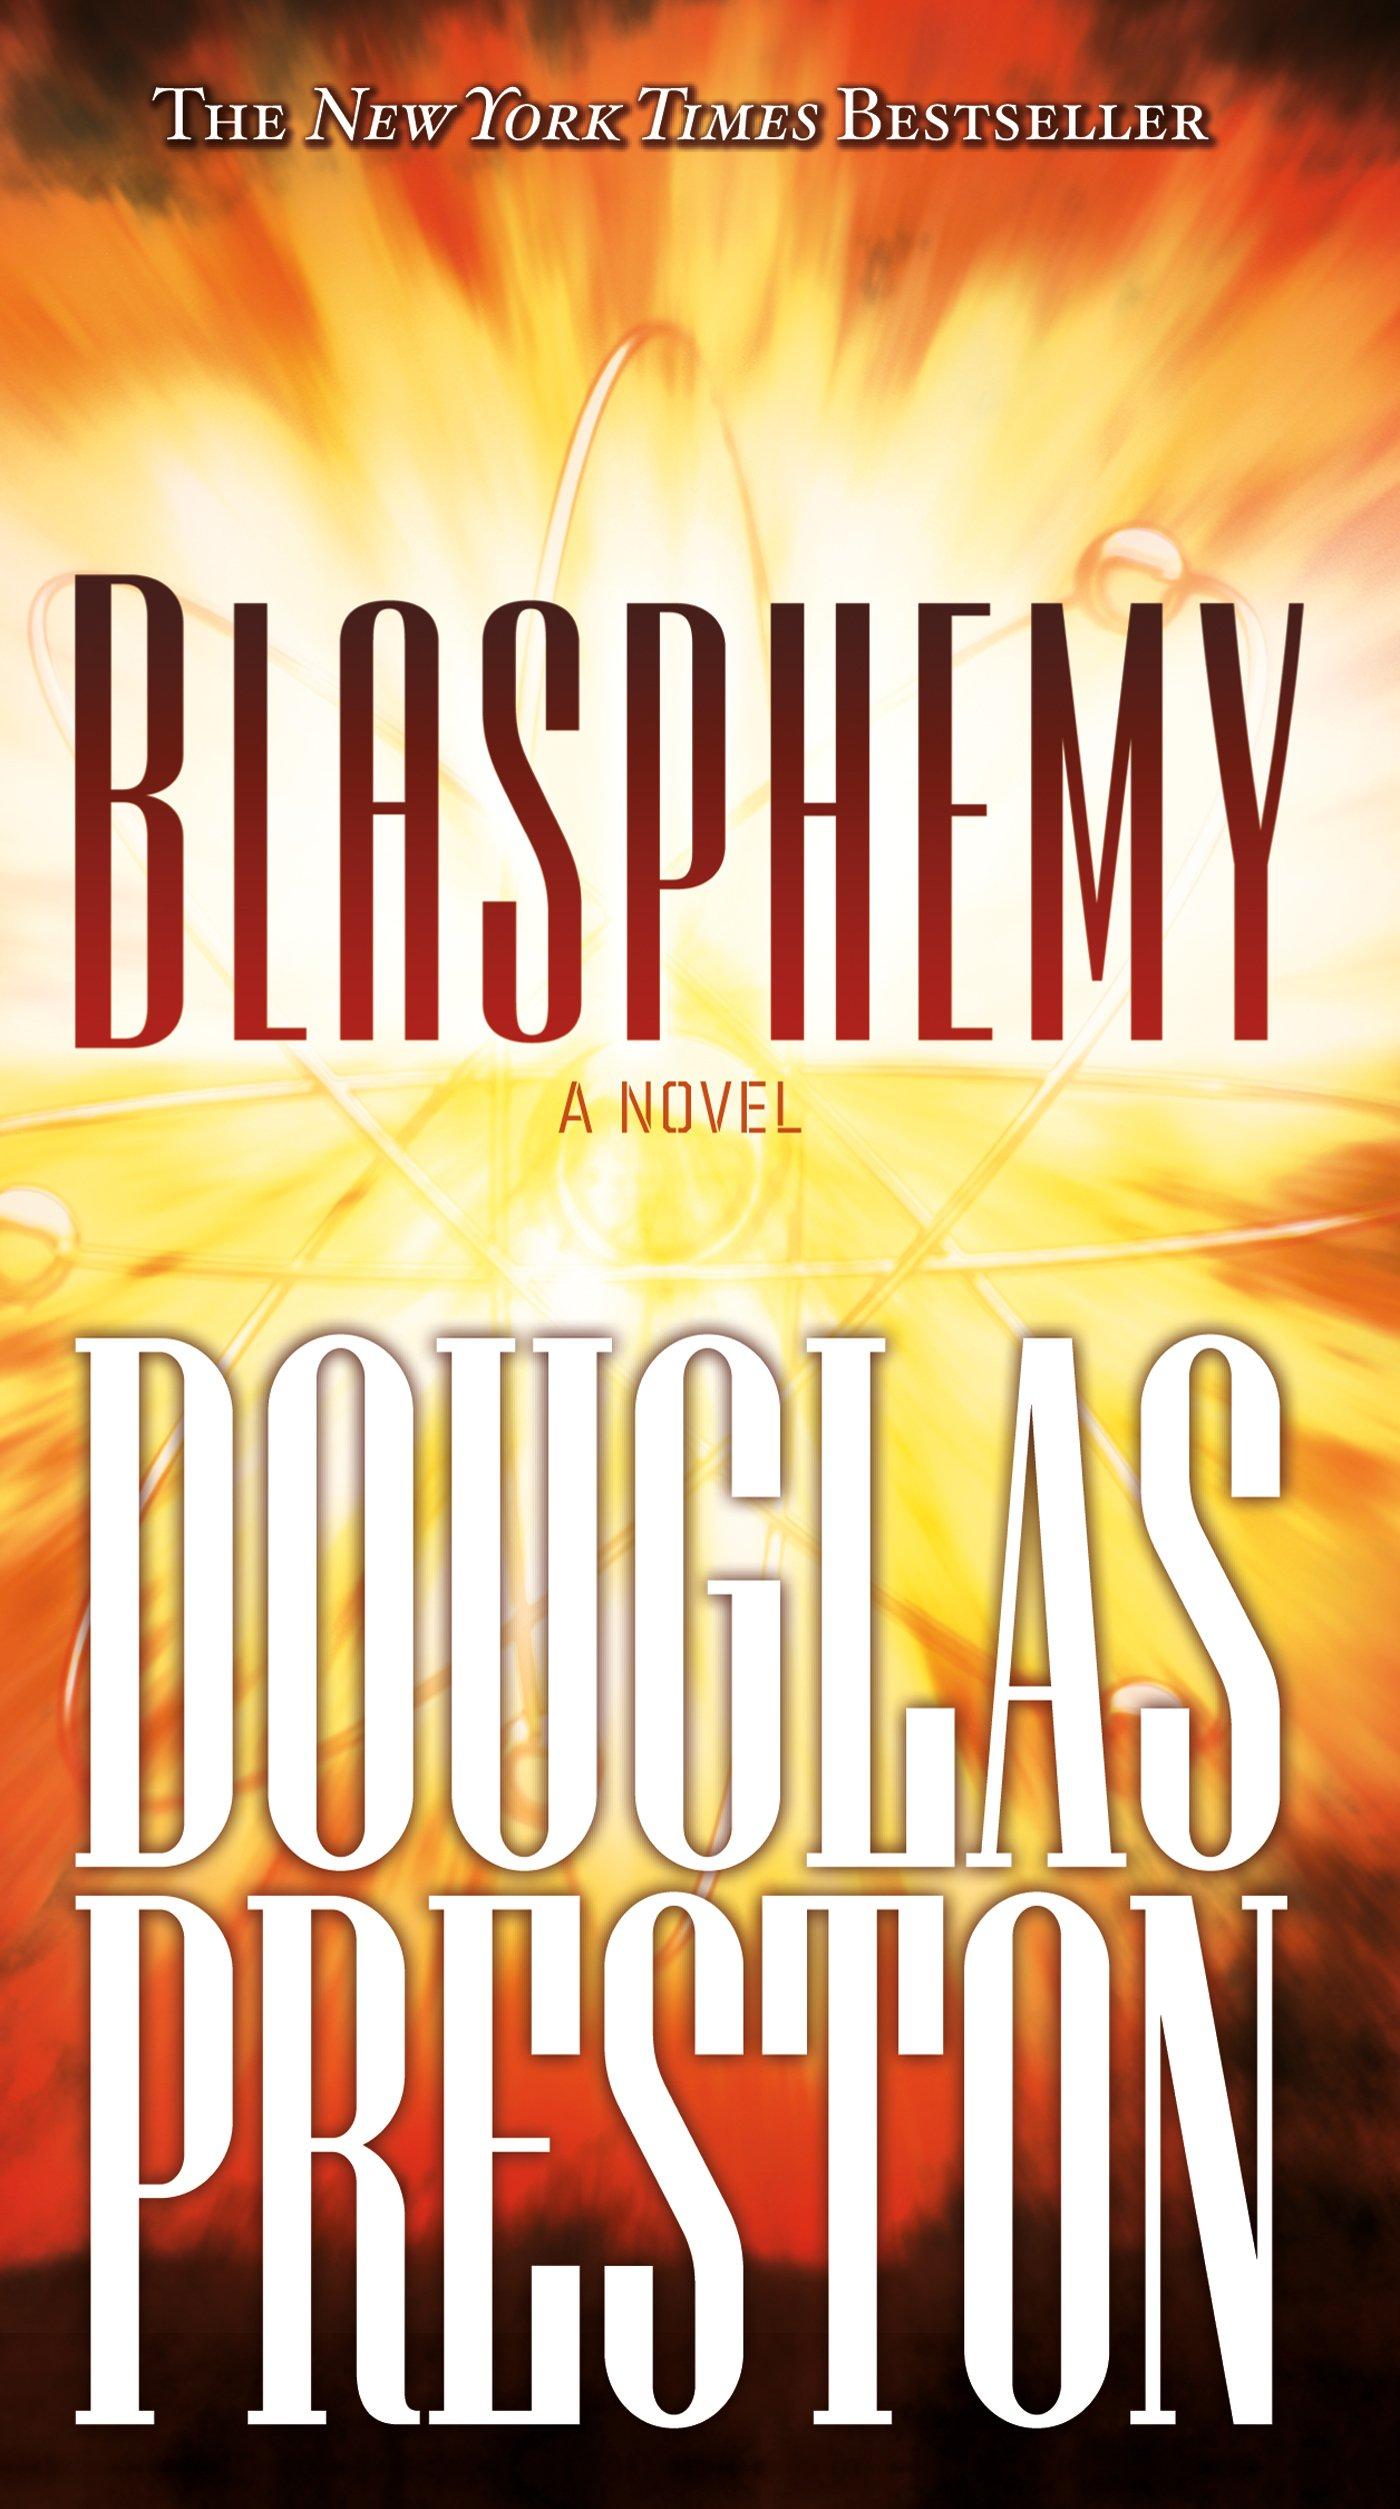 Blasphemy: A Novel (Wyman Ford Series): Douglas Preston: 9780765349668:  Amazon.com: Books